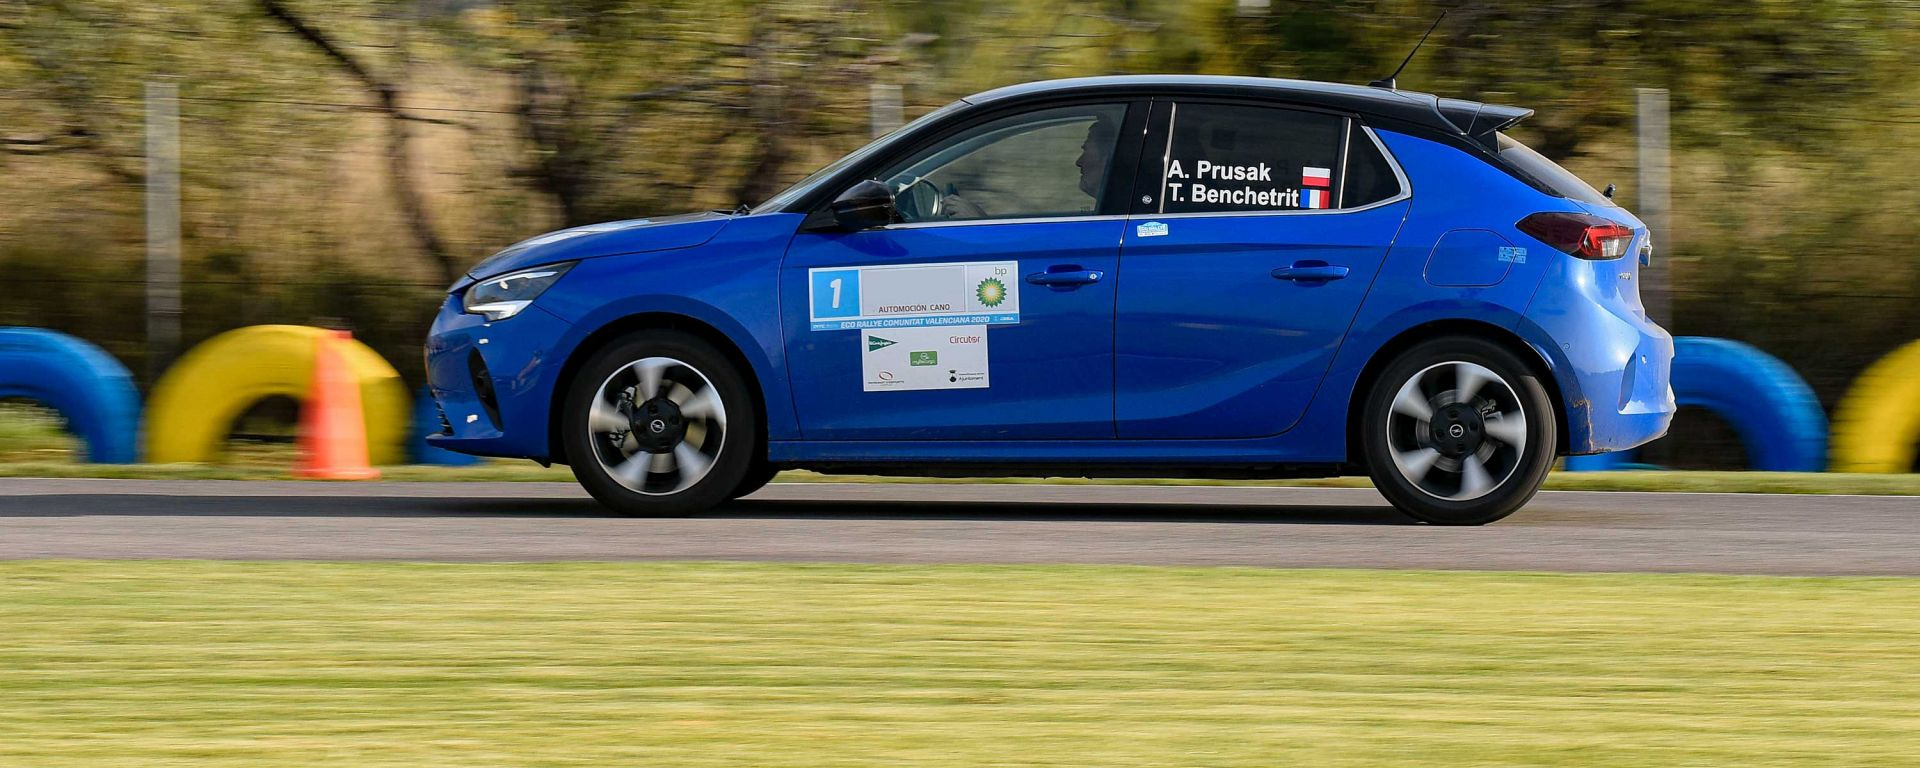 FIA E-Rally Regularity Cup 2020: Opel Corsa-e